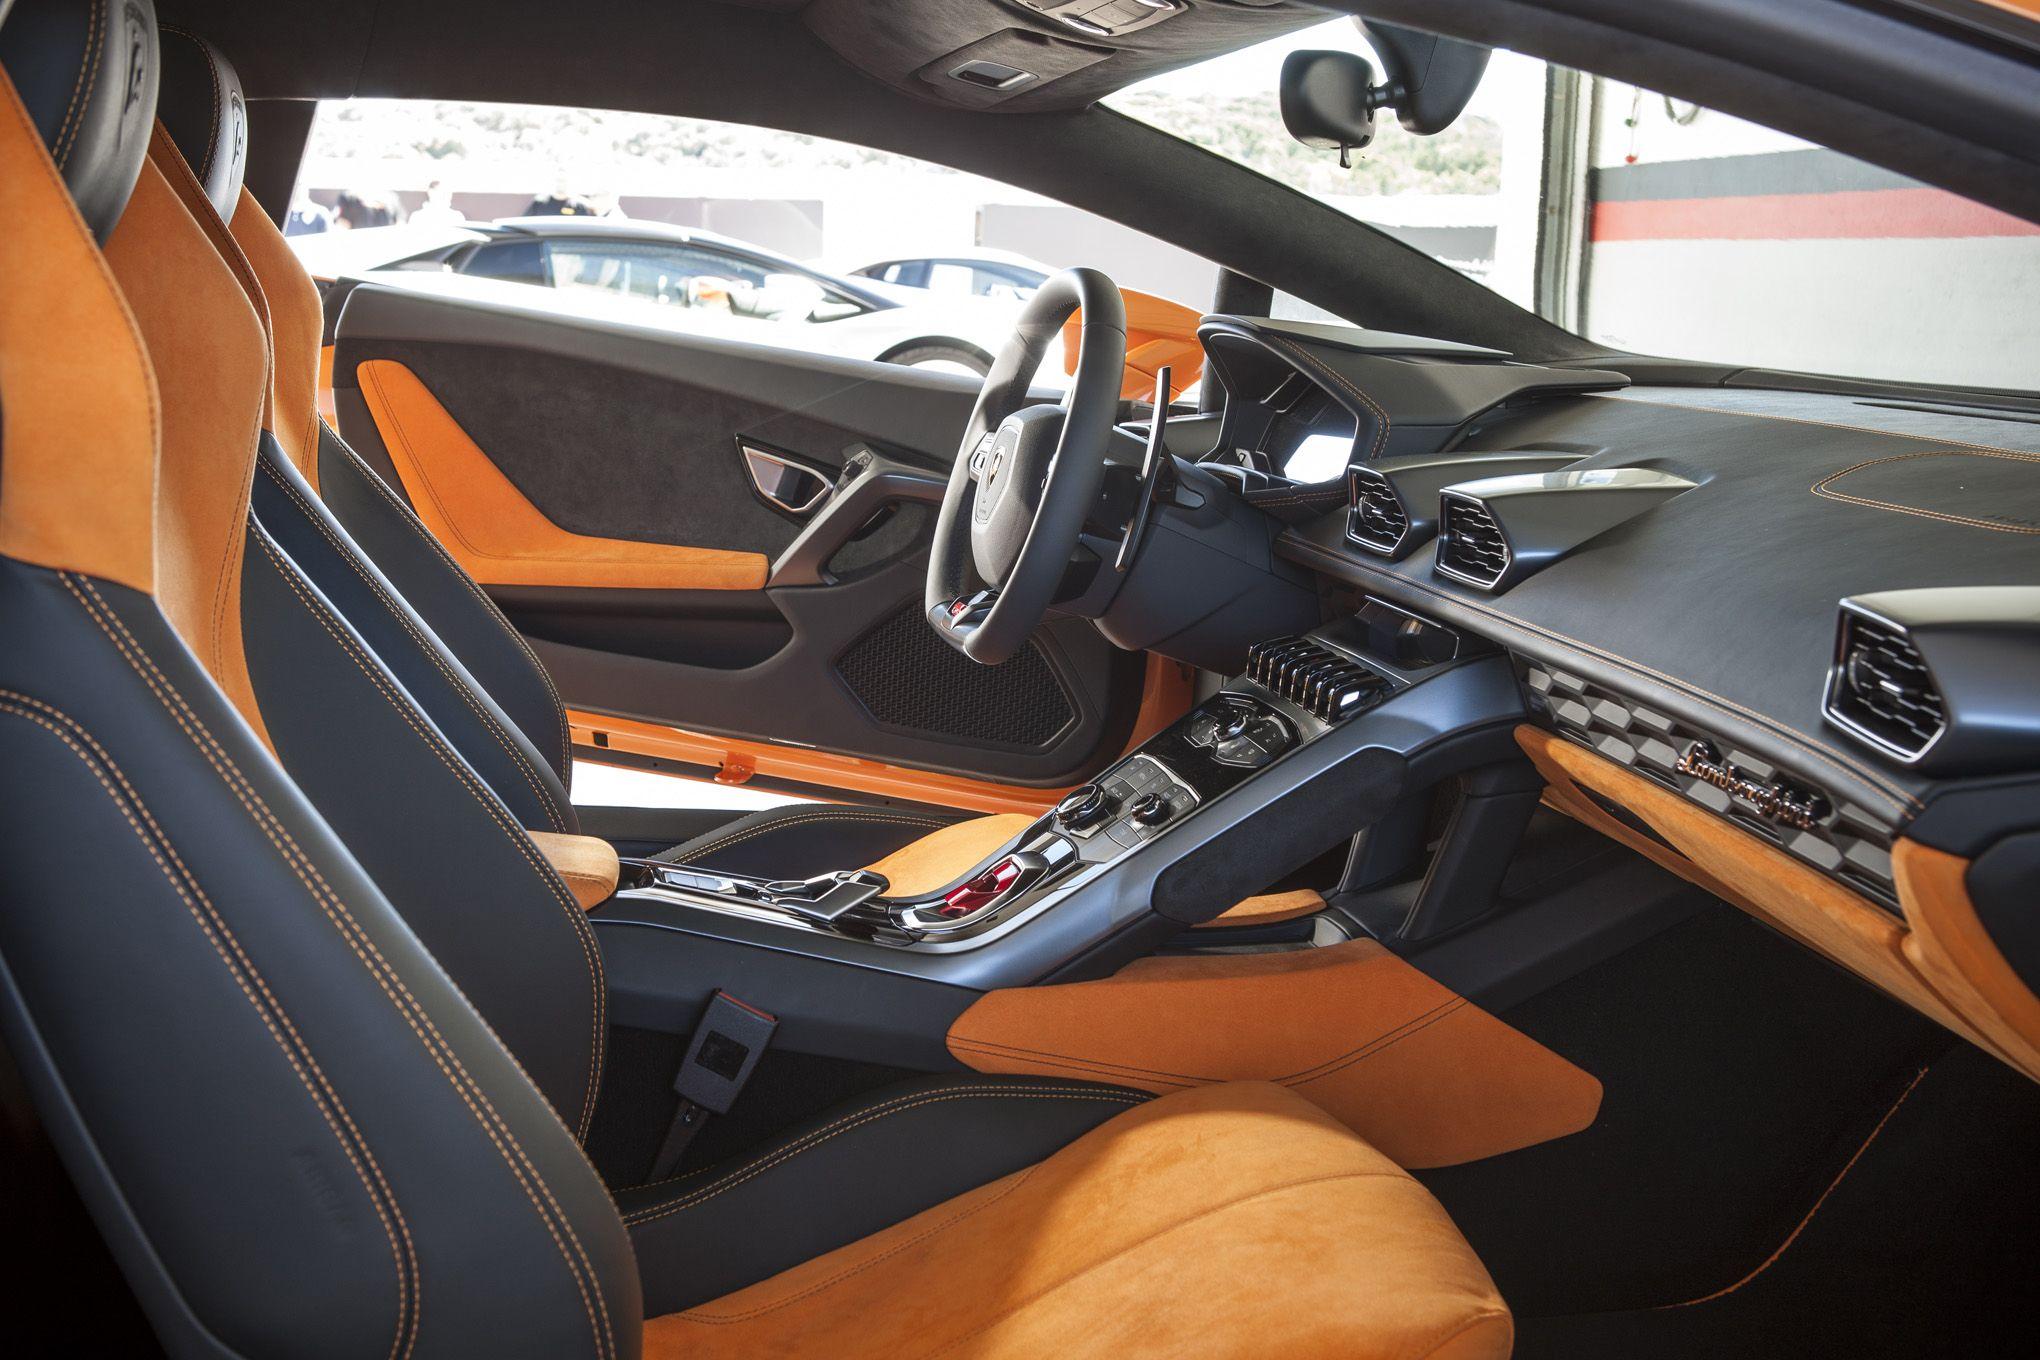 2015 lamborghini huracan lp 610 4 orange interior passenger seat conceptcars stylendesignscom